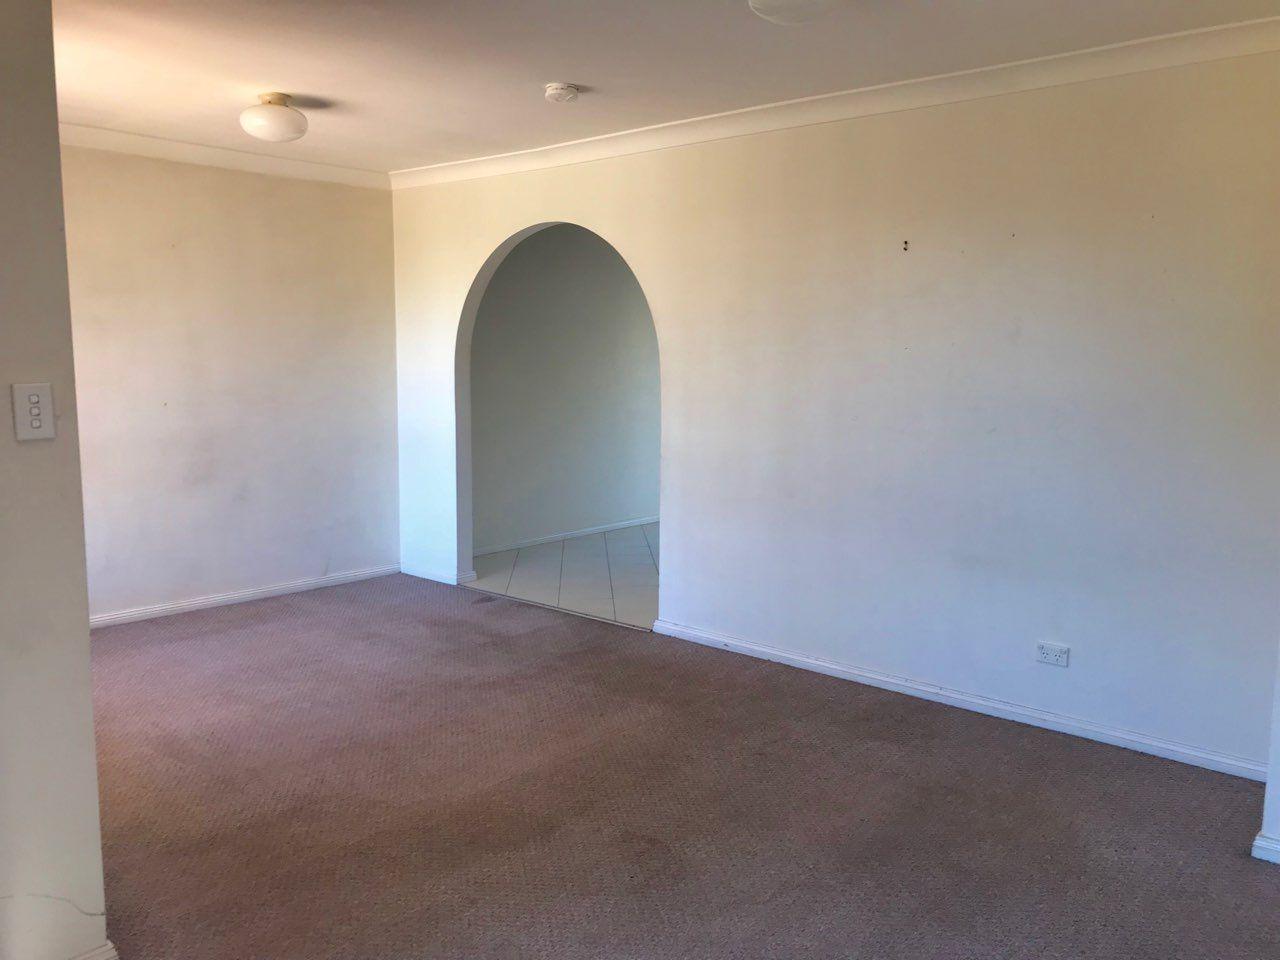 13/37 Patricia Street, Blacktown NSW 2148, Image 1